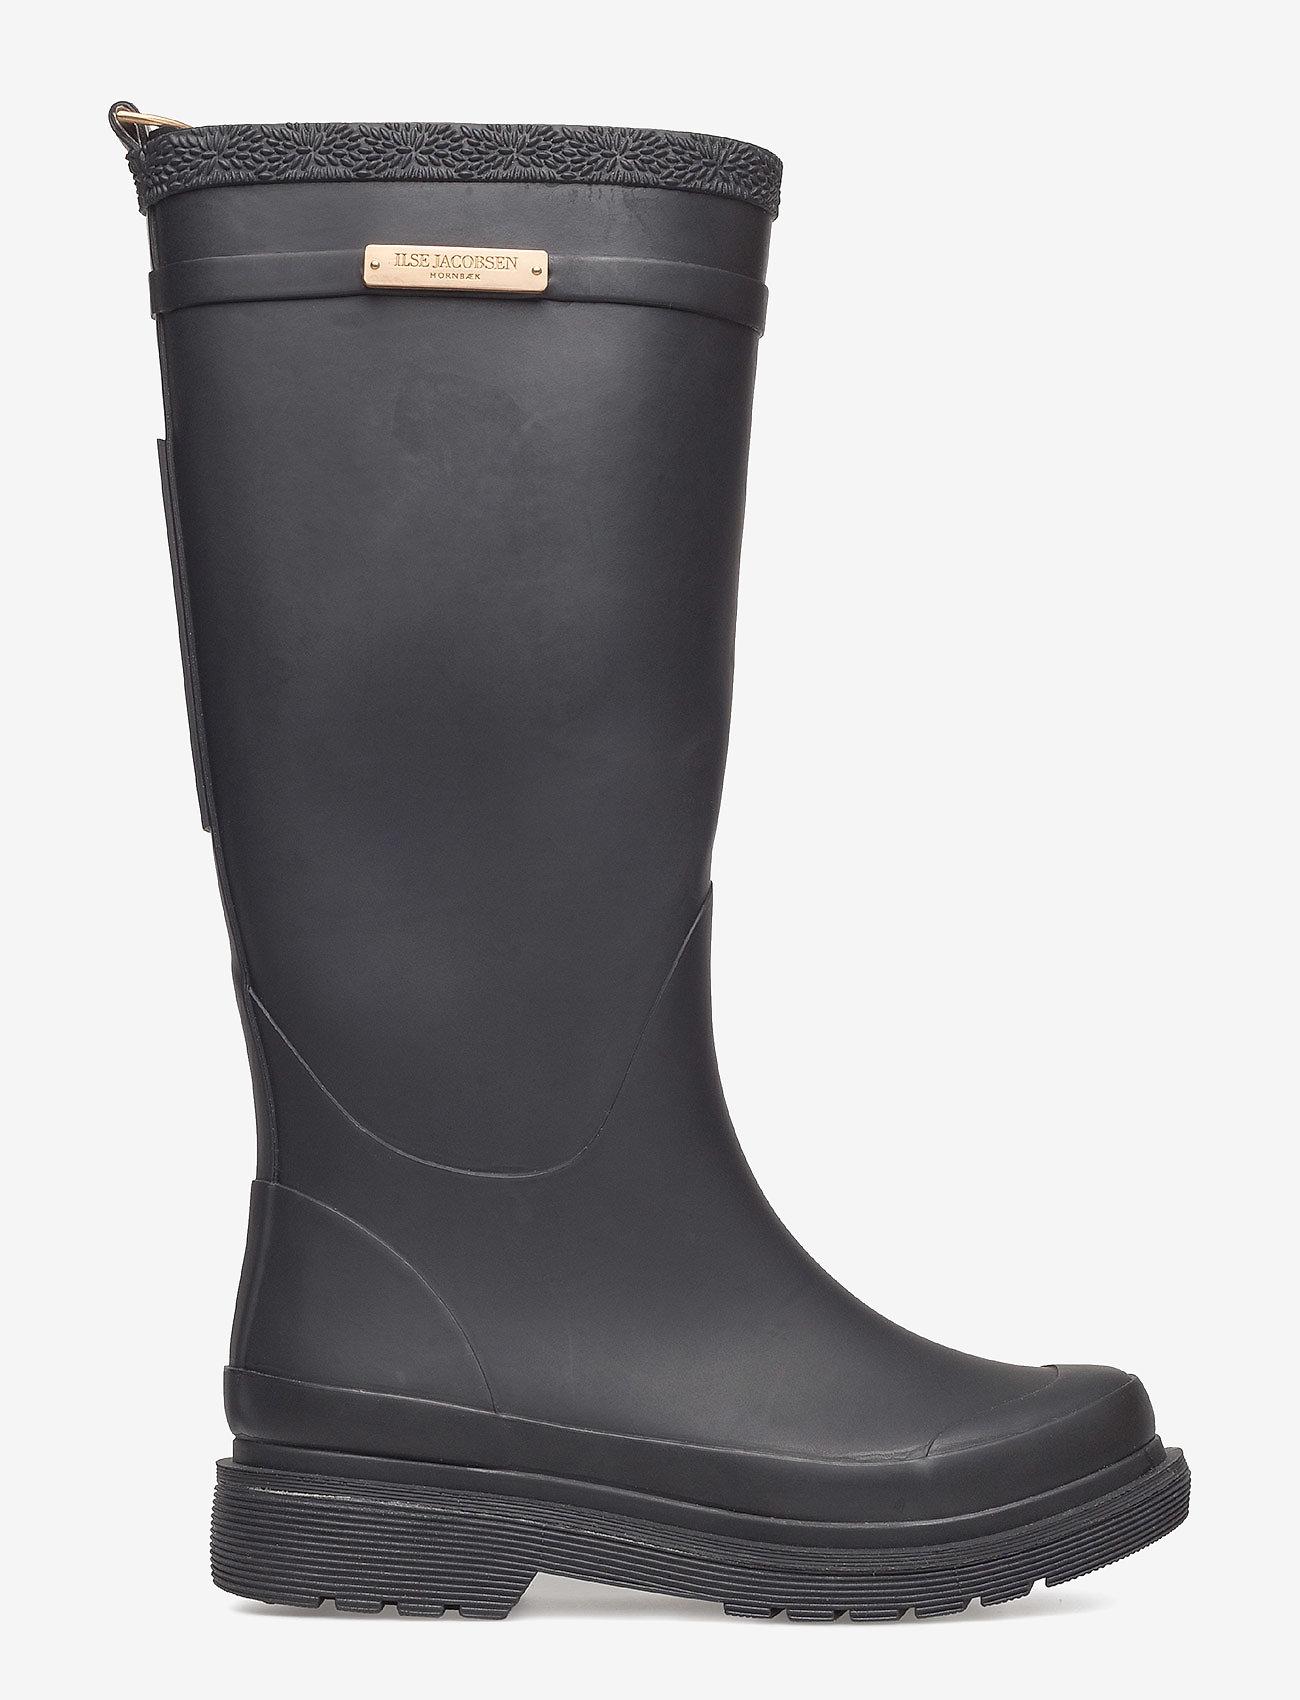 Rubber Boots (Black) - Ilse Jacobsen OYwruO